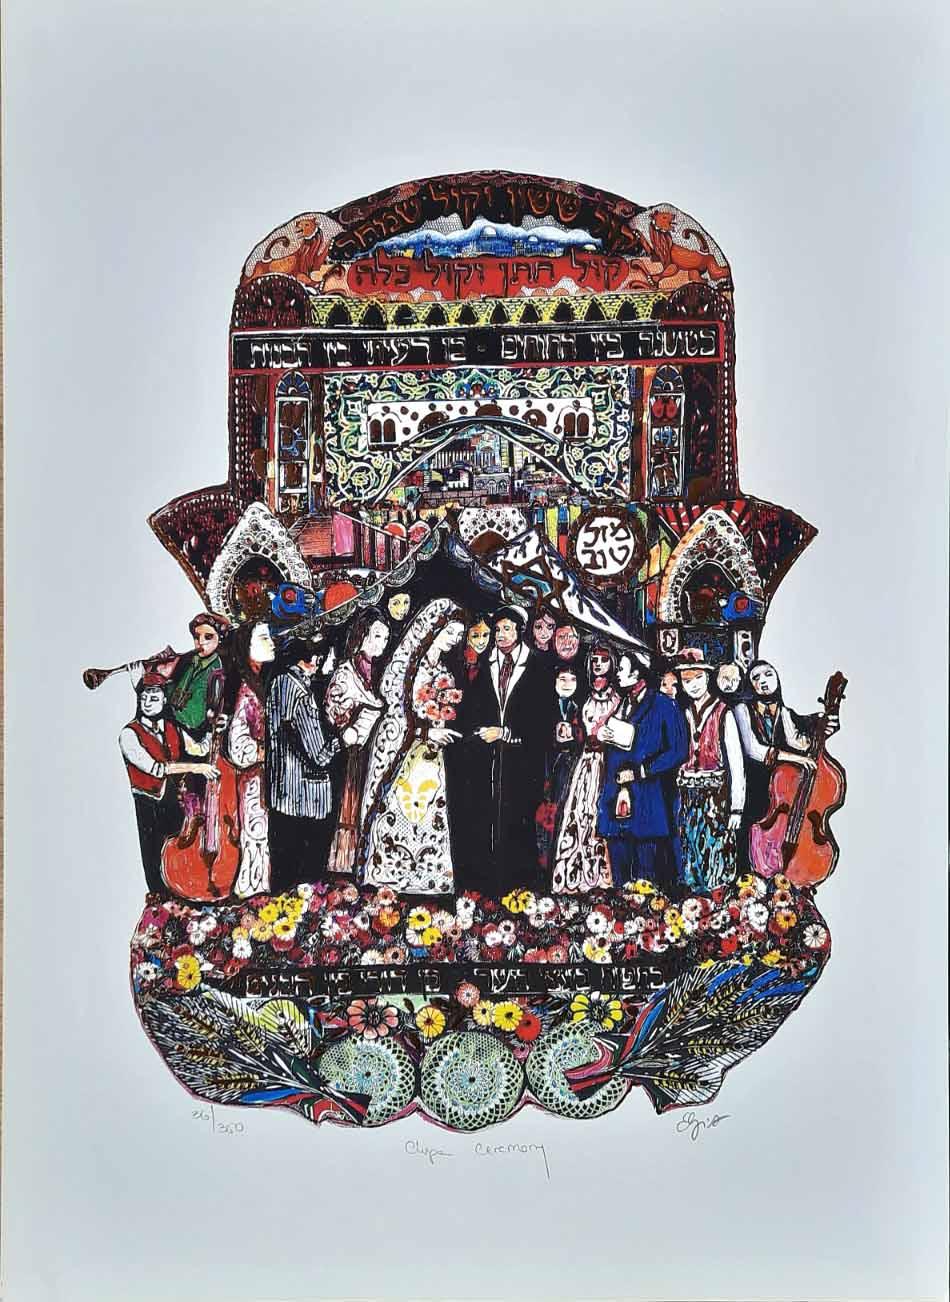 Huppah Ceremony by Amram Ebgi